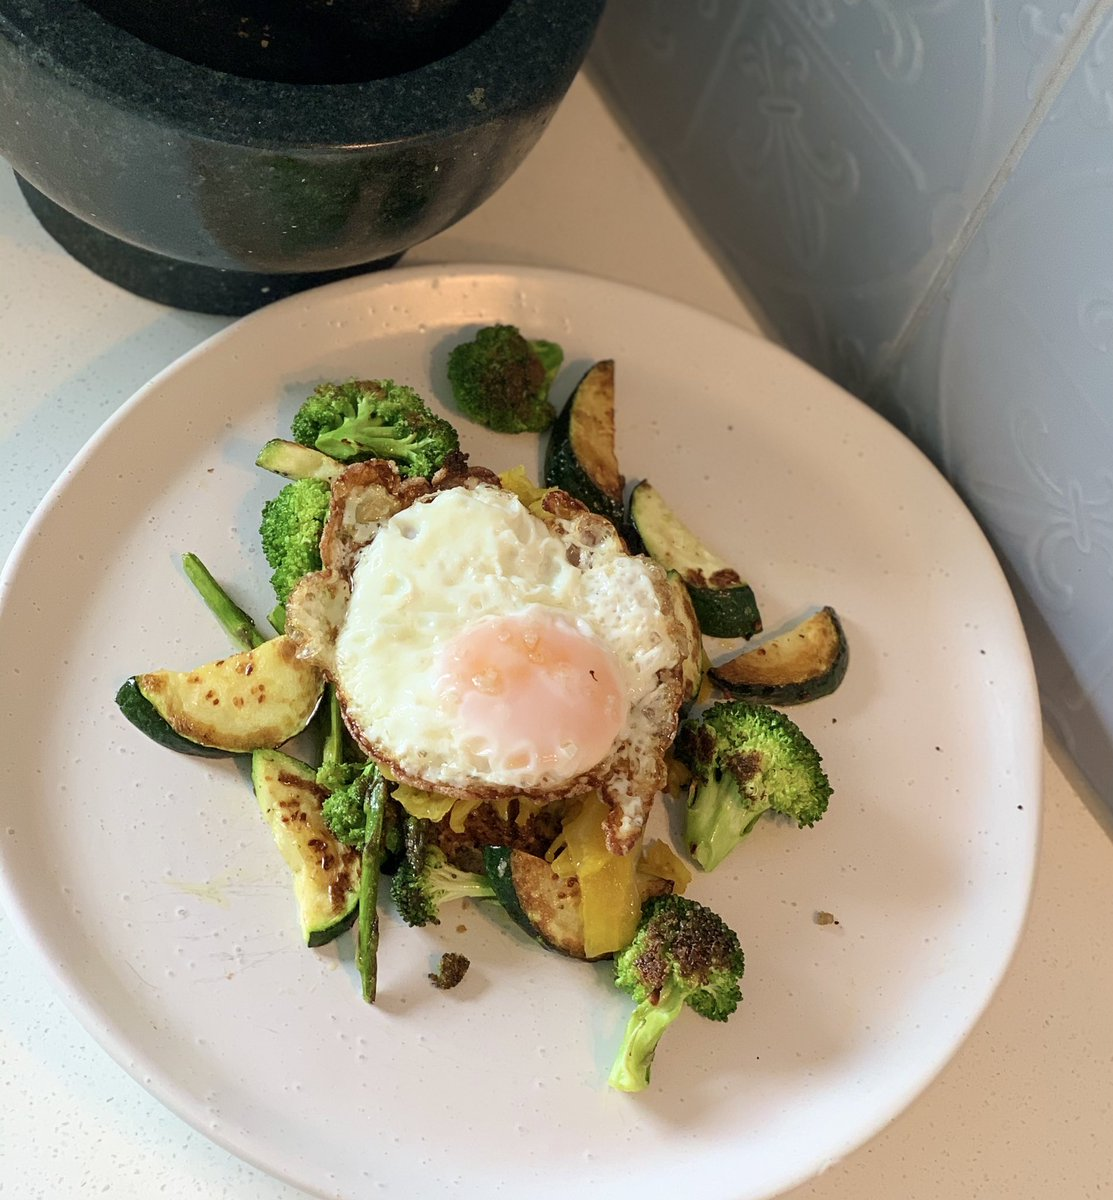 What's your breakfast look like? #goodfats #protein #glutenfree #wholefoods #greenveggies